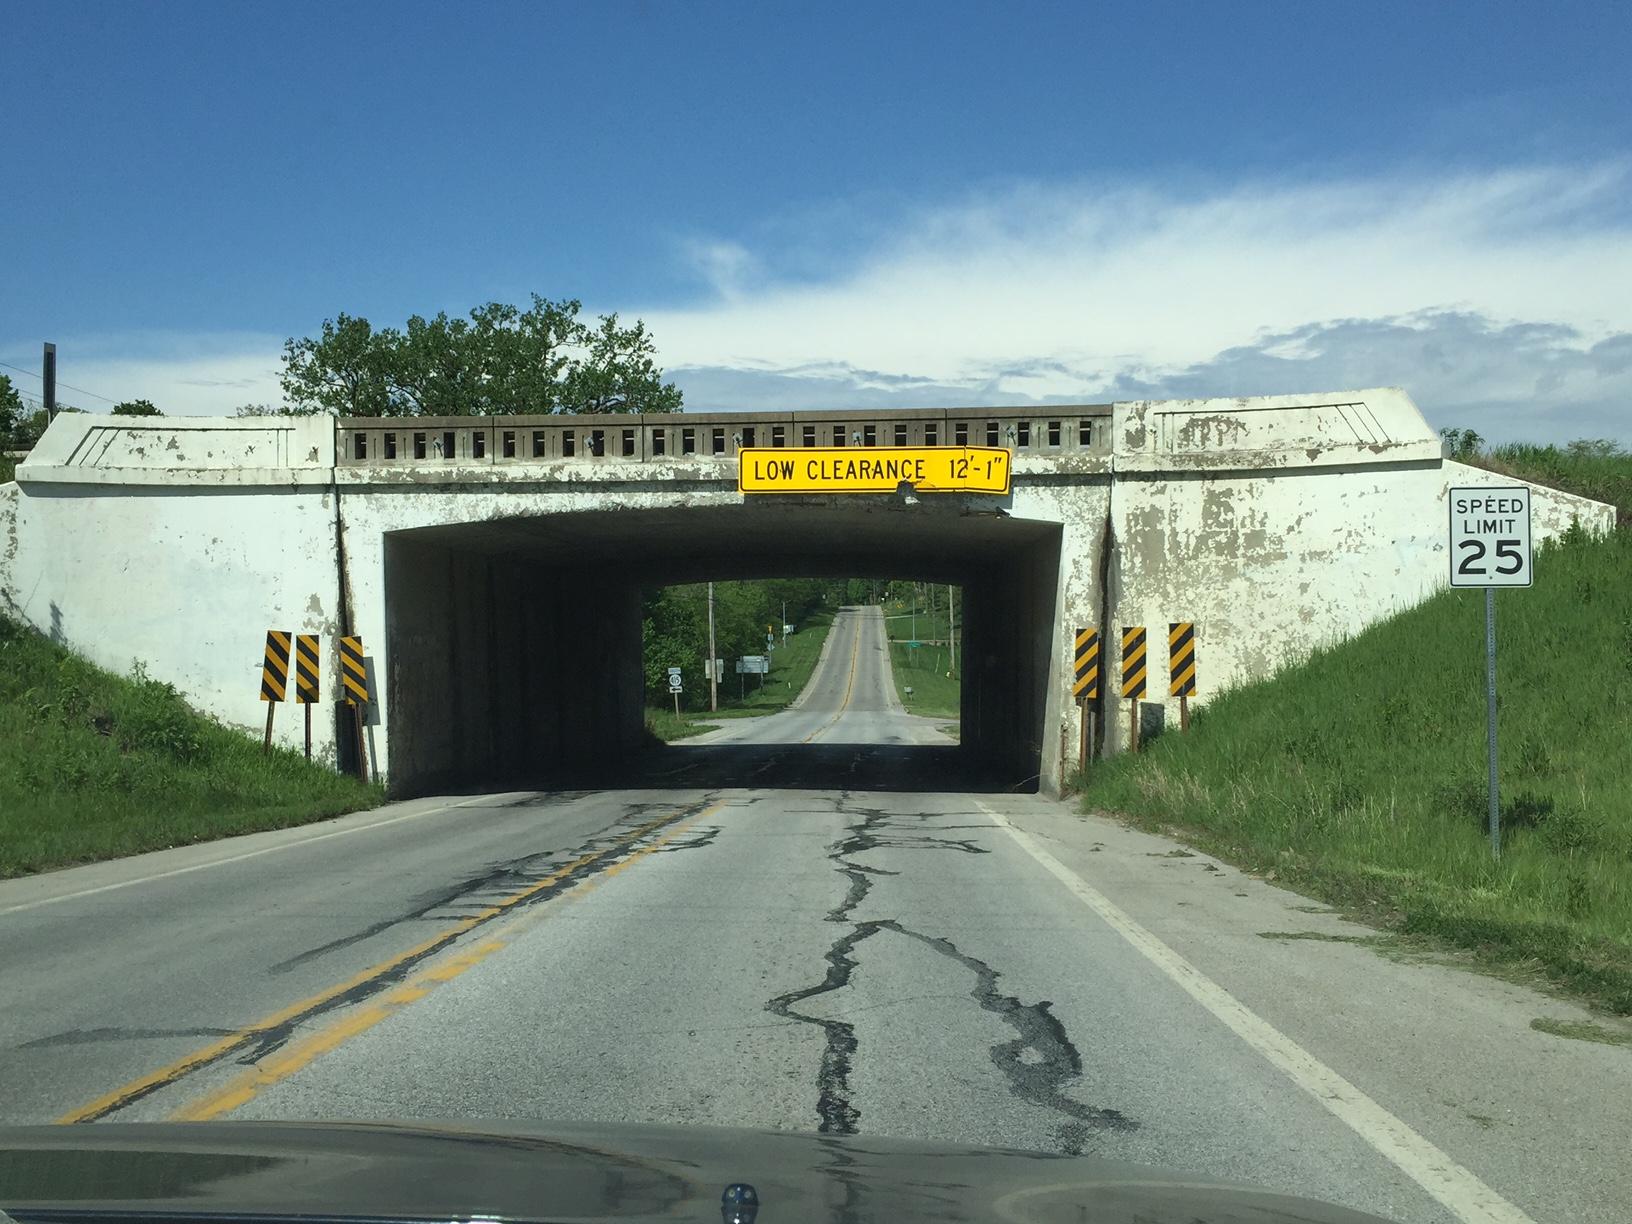 One of Iowa's structurally deficient bridges